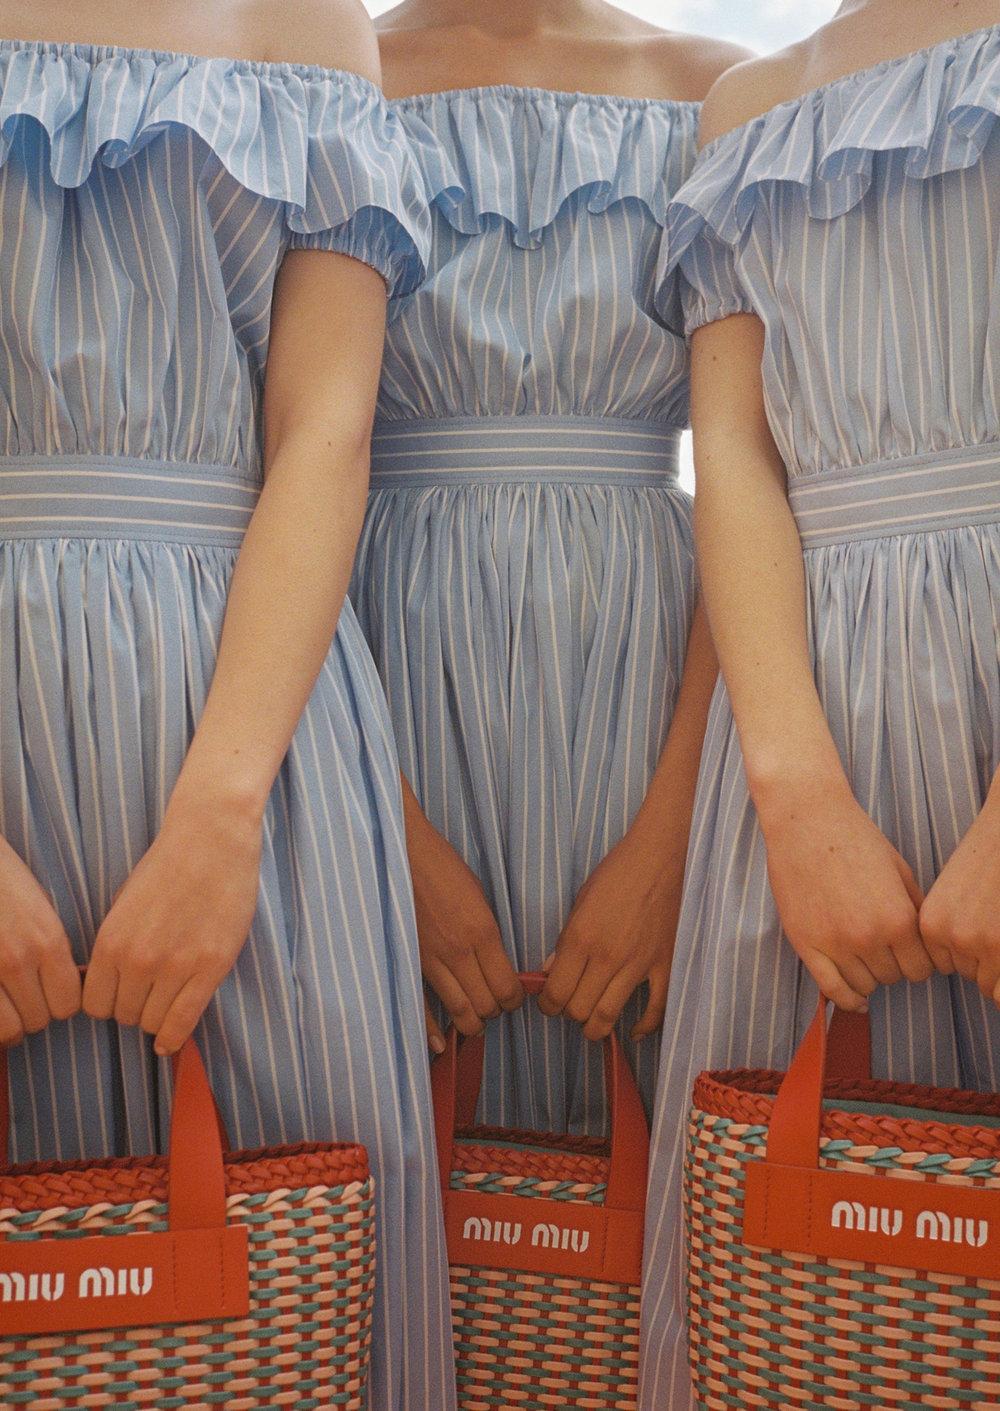 MIU MIU x #ophelieandthegirls.jpg